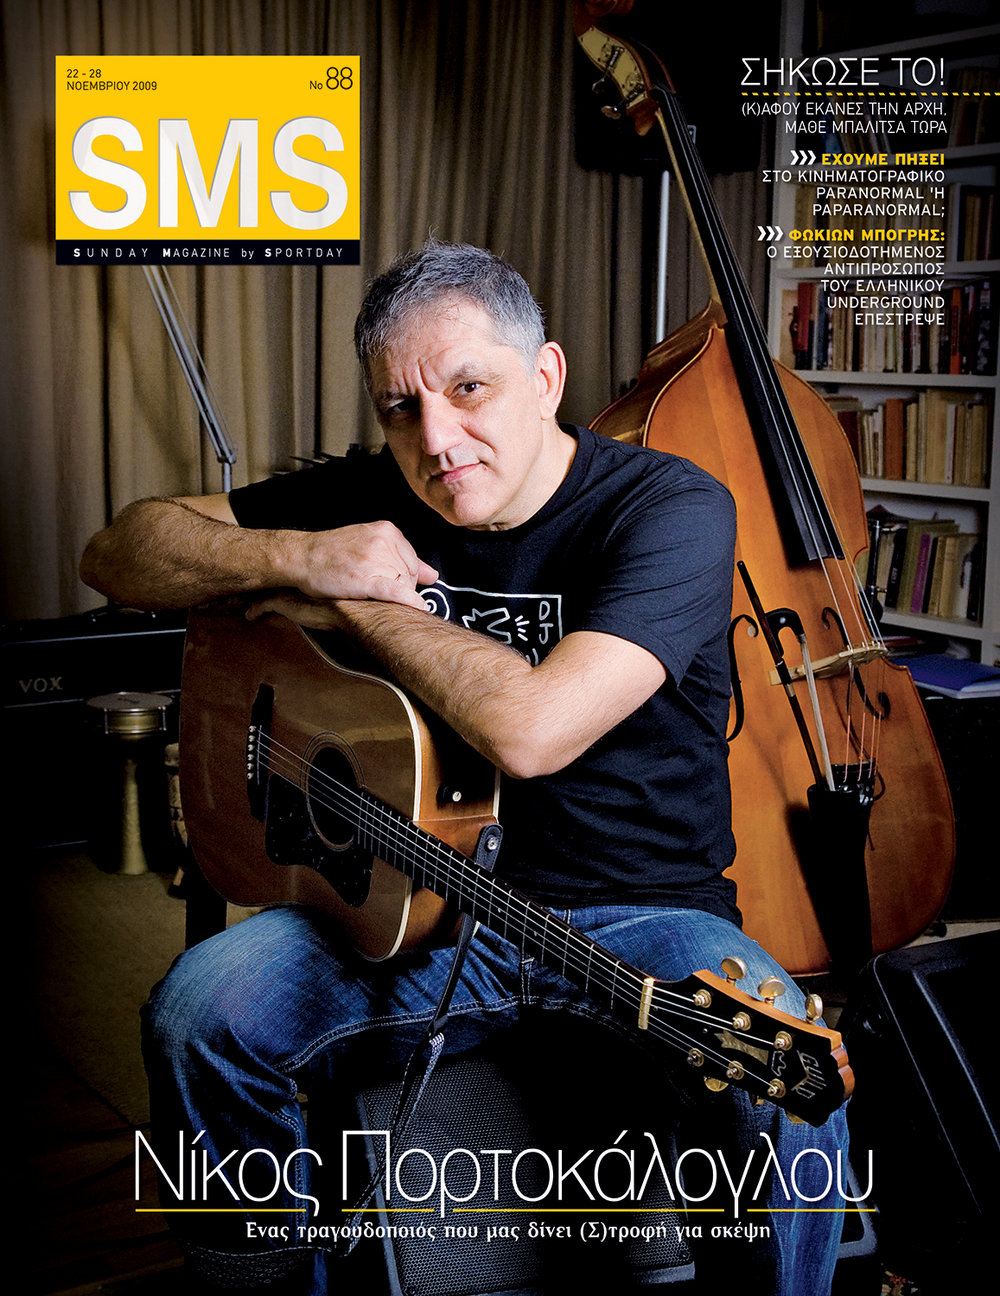 Nikos Portokaloglou / singer-composer-lyricist / SMS Sportday No 88